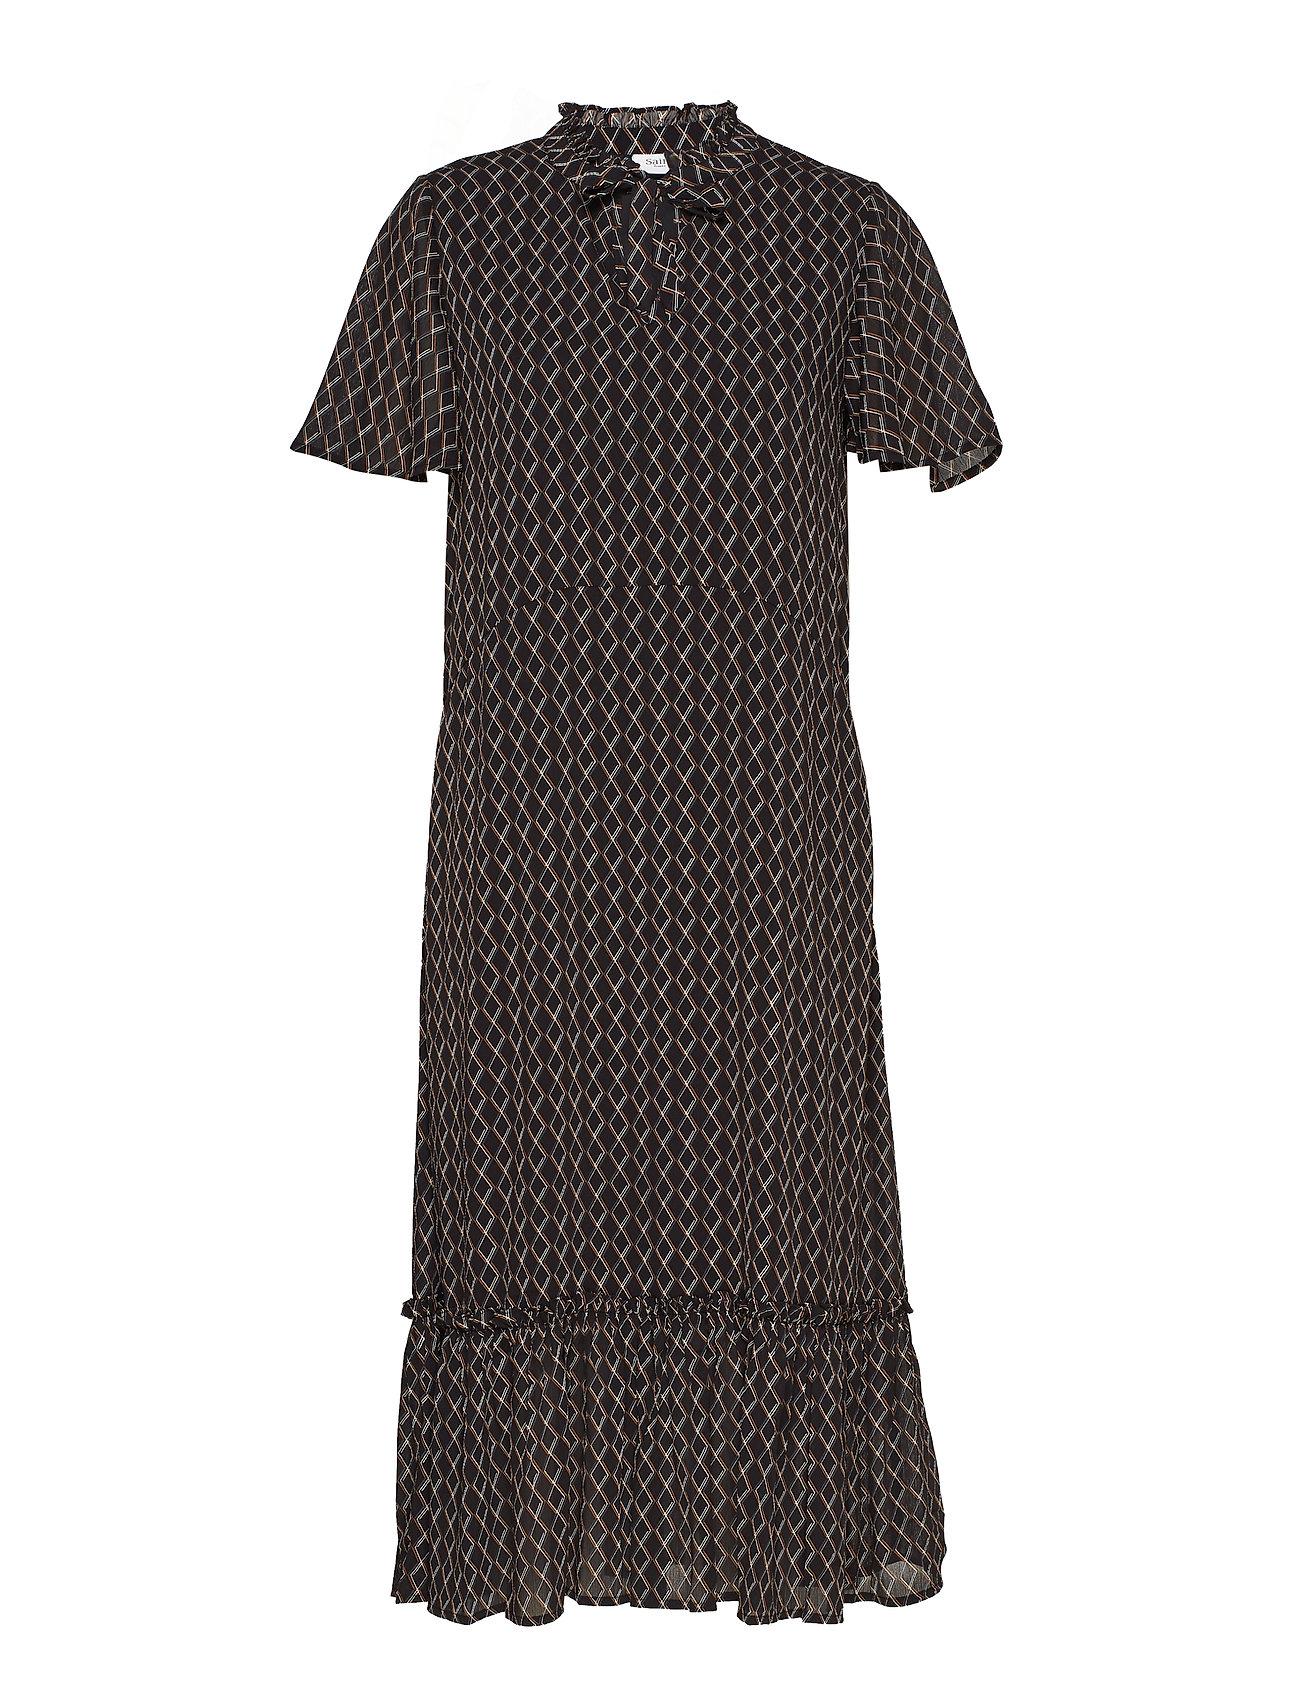 Saint Tropez U6114, WOVEN DRESS - MAXI - BLACK